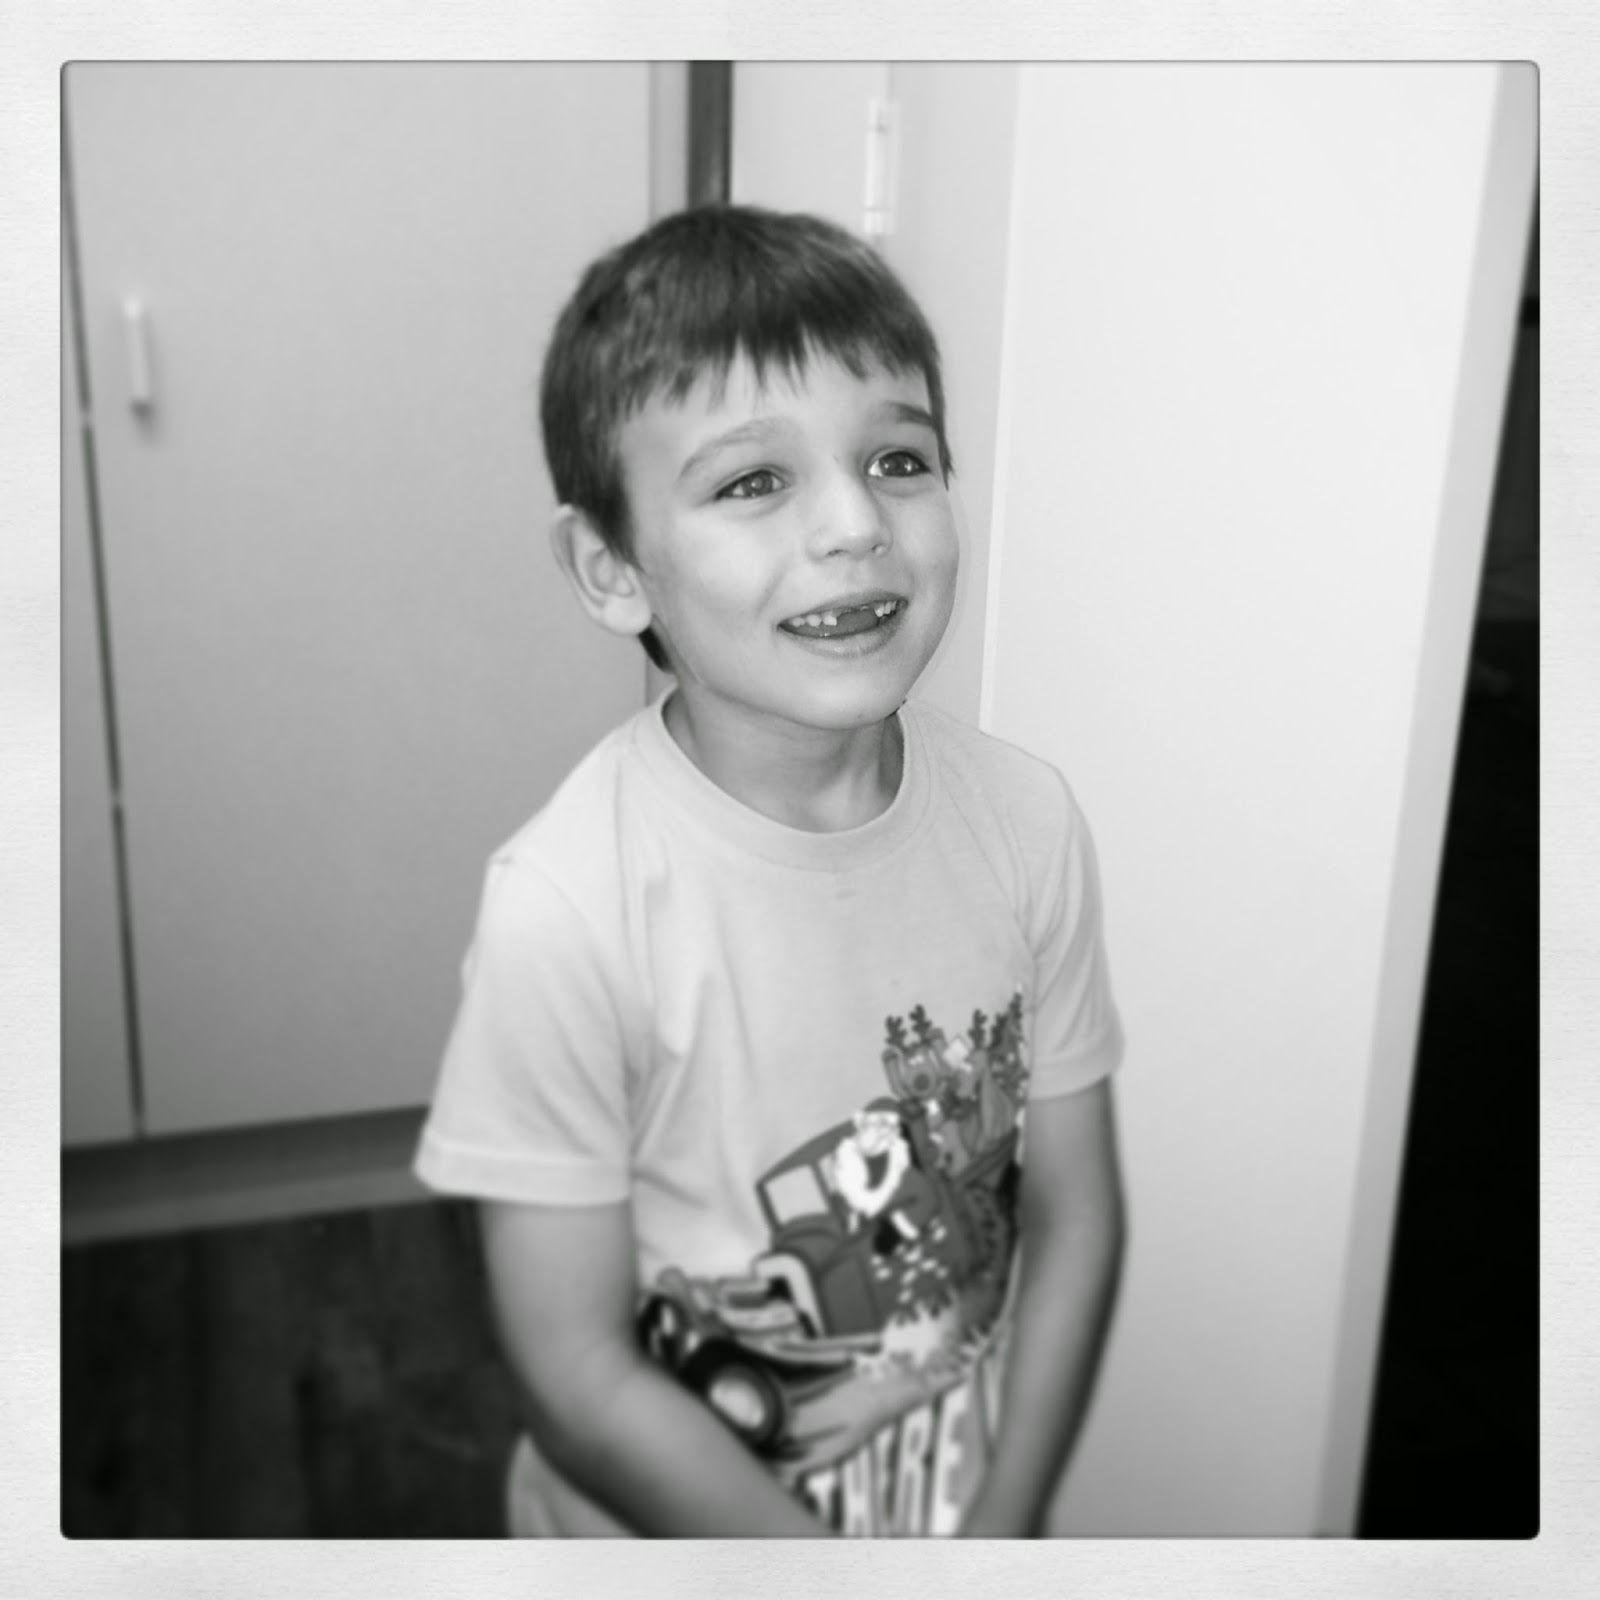 Jonty discovering The Elf on the Shelf